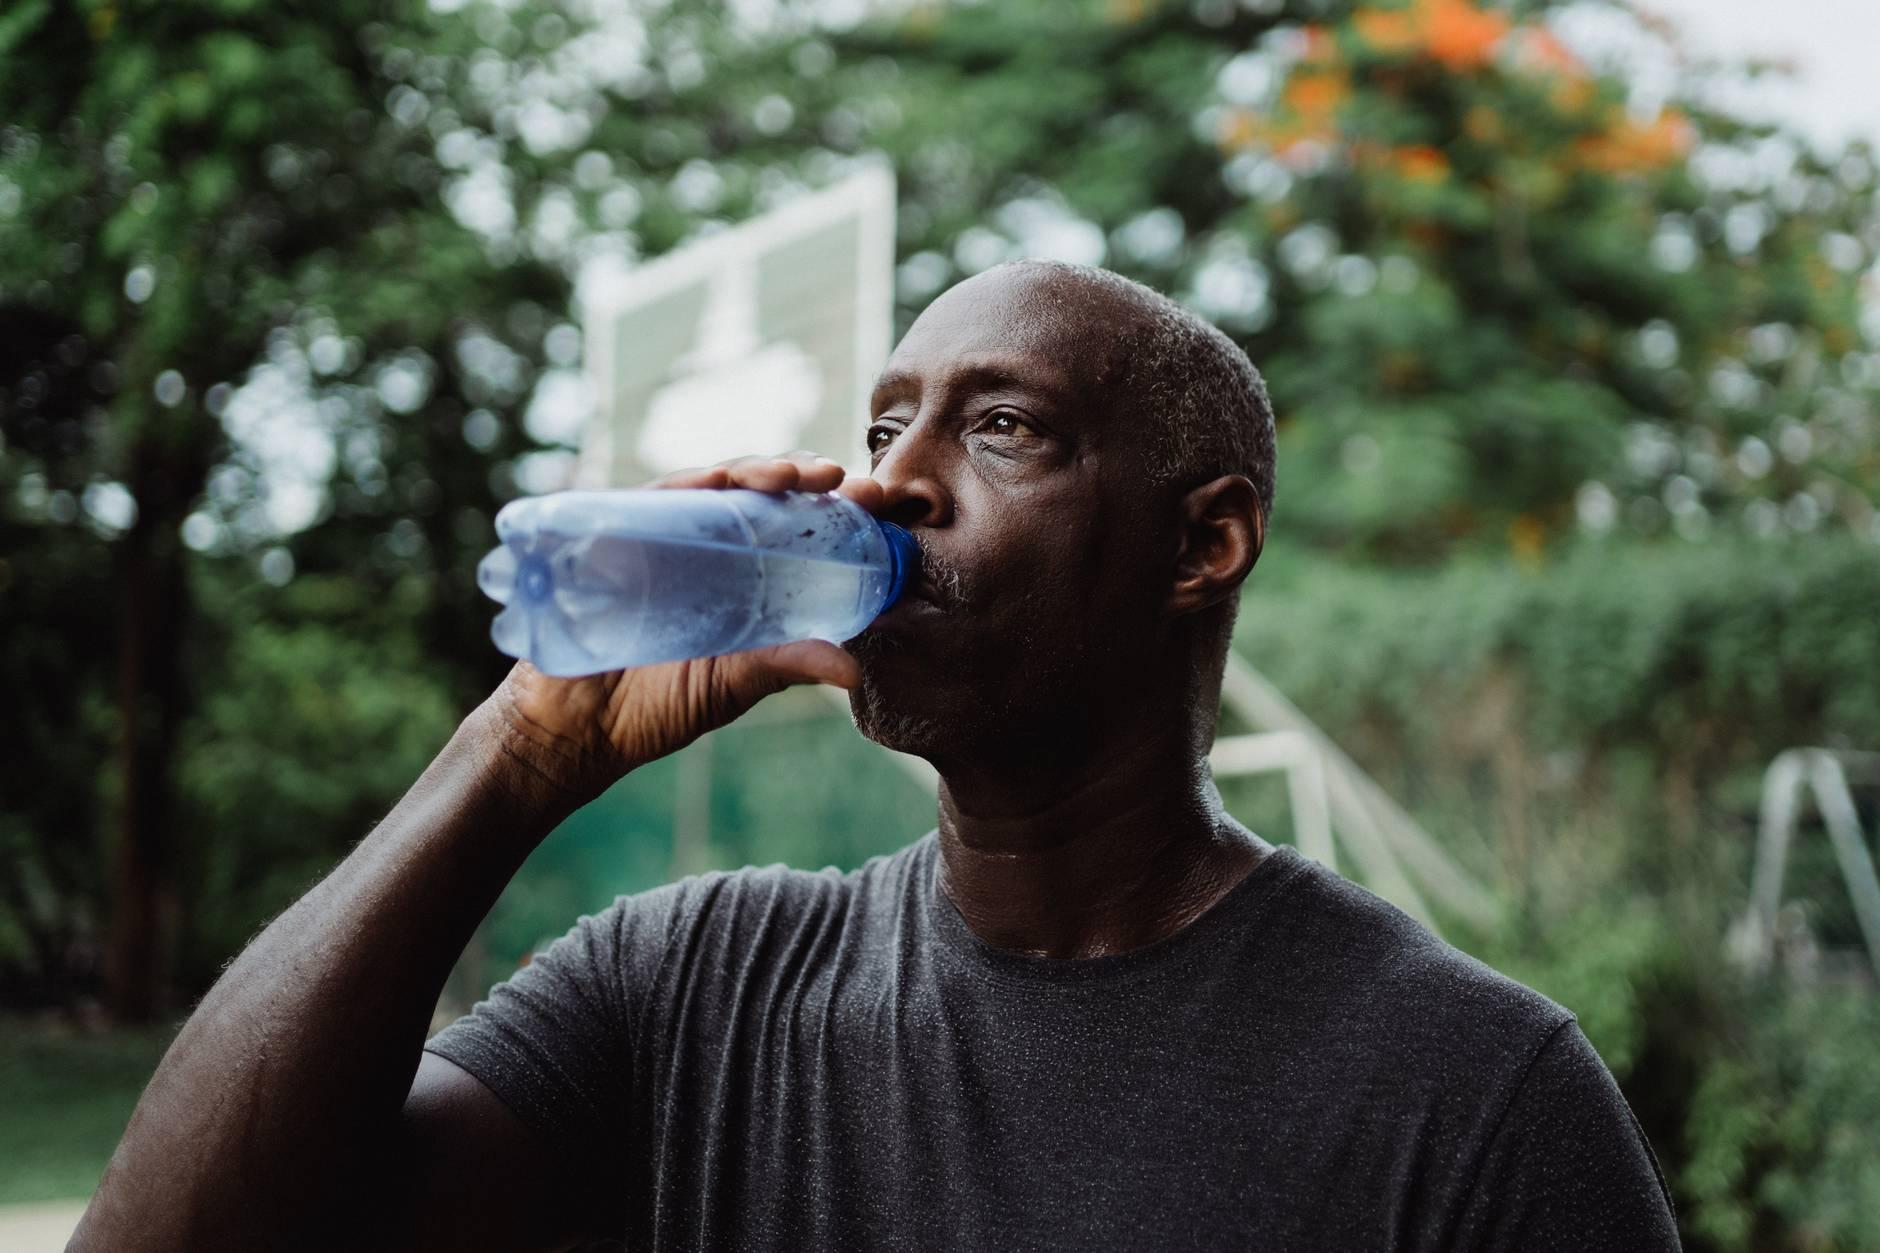 man in gray crew neck shirt drinking water